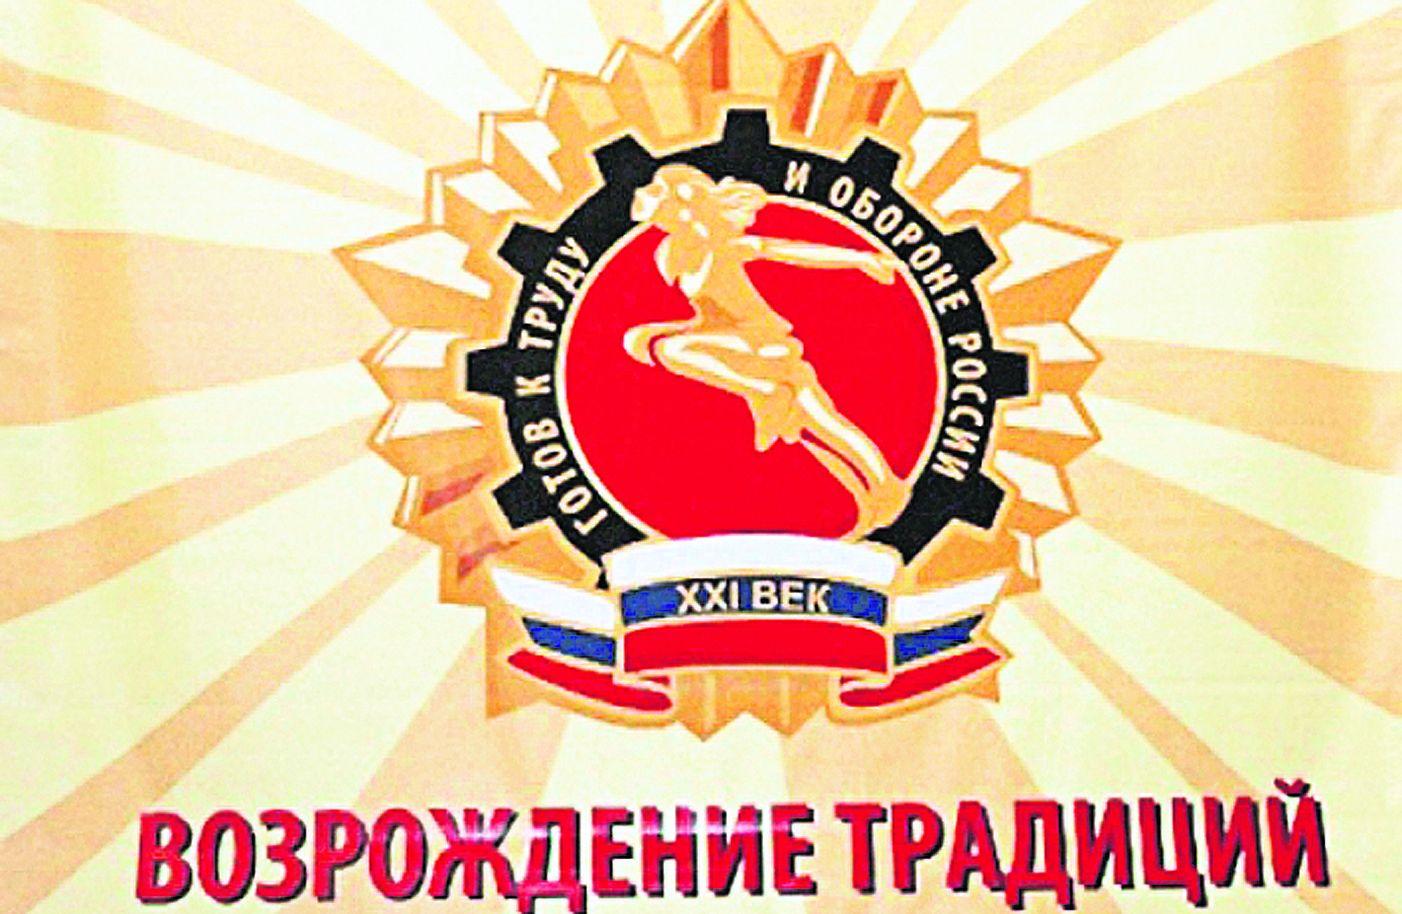 http://www.mospravda.ru/upload/iblock/2c9/2c9adbd06c9464c55604a5d0e4a65db4.jpg